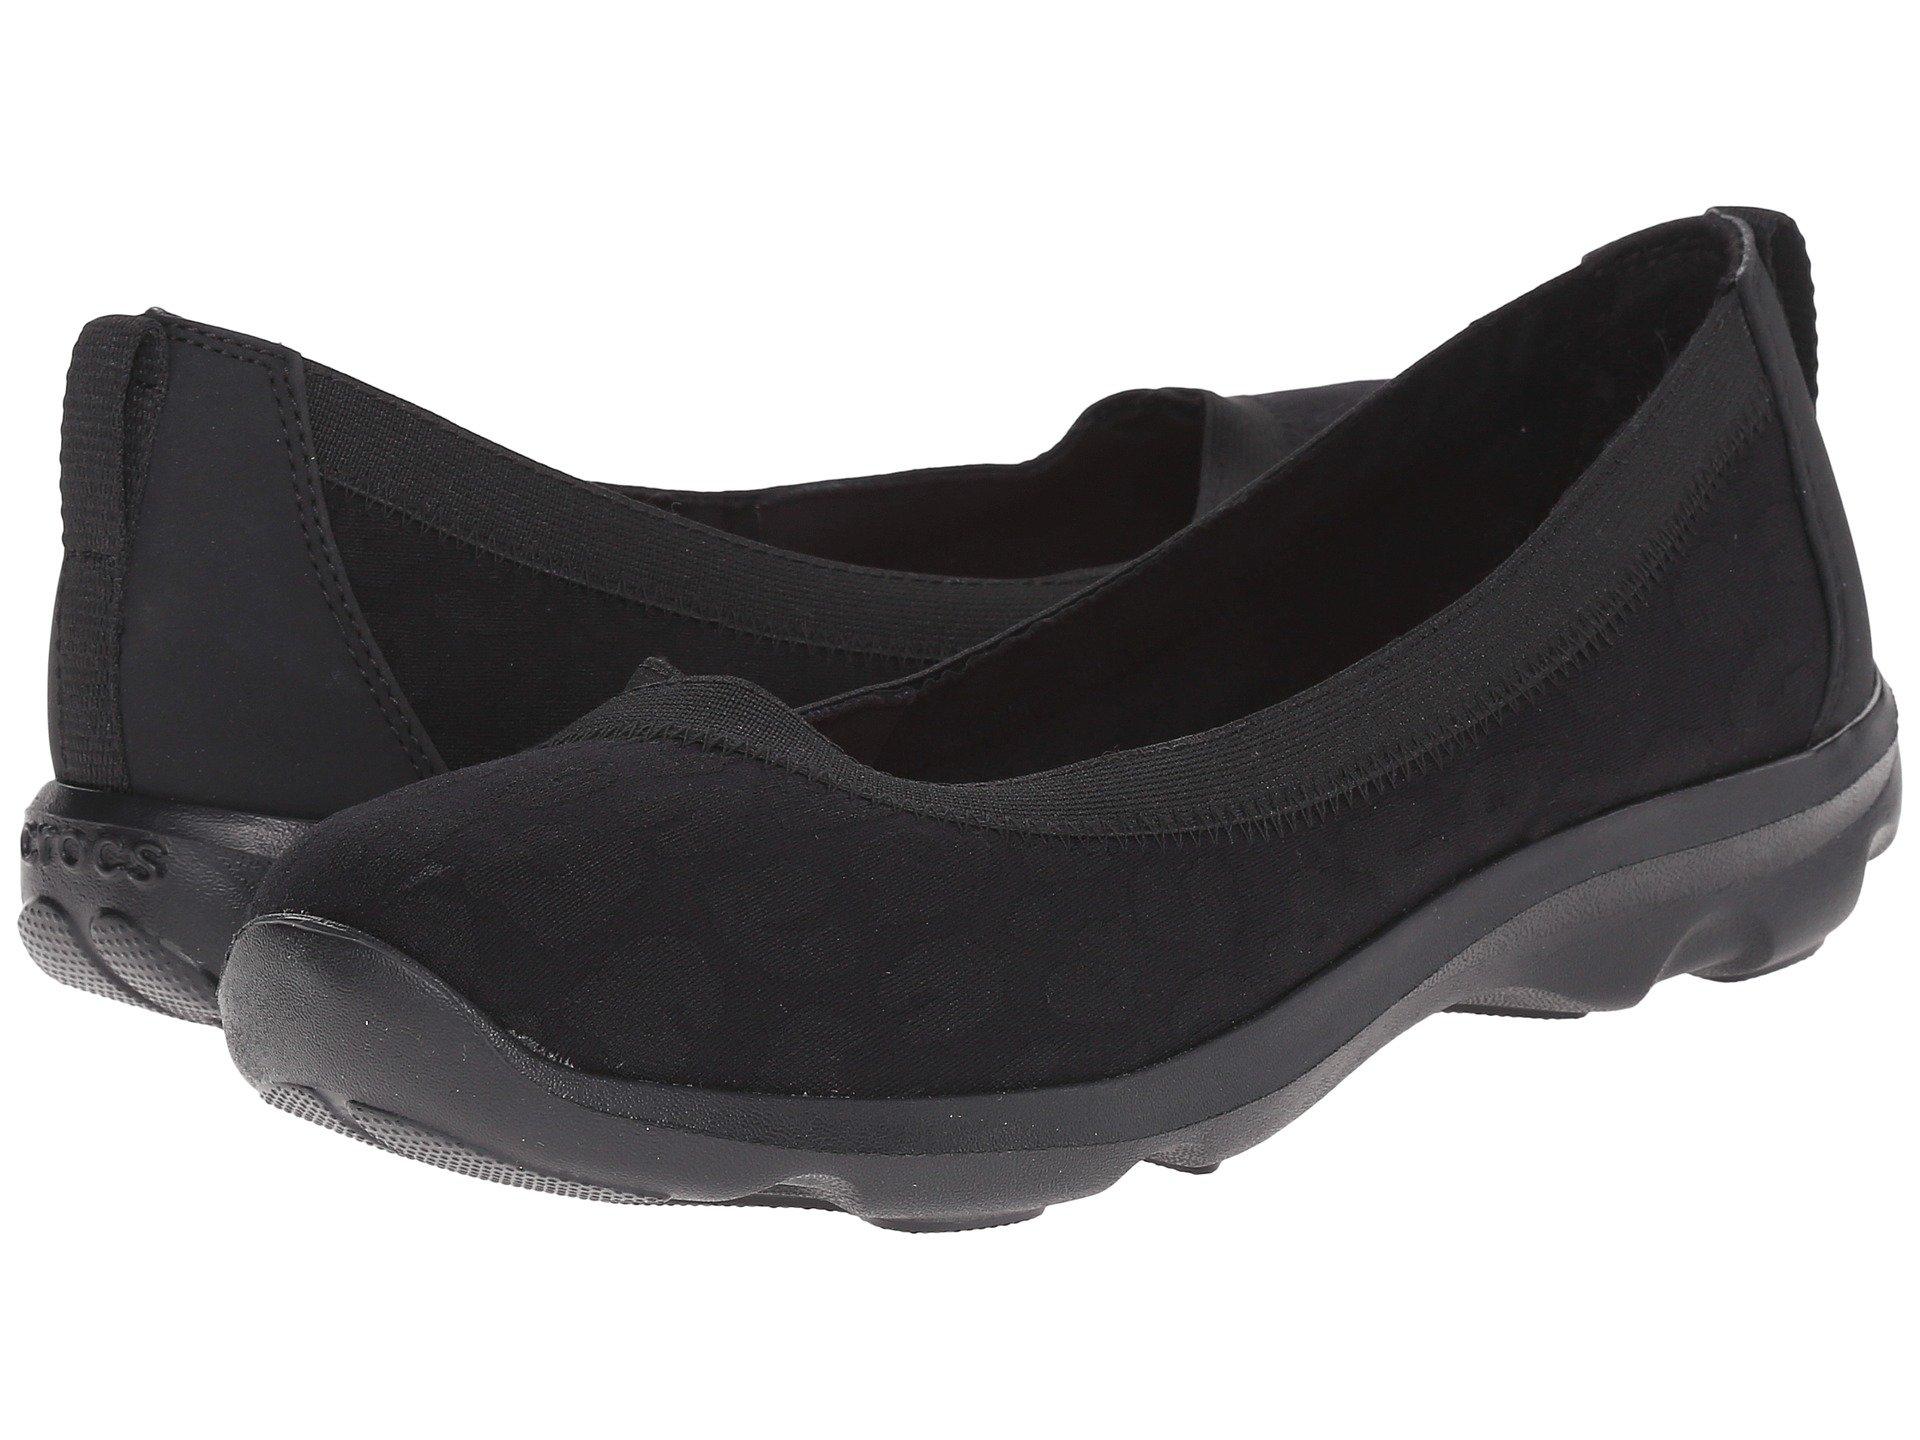 Baletas para Mujer Crocs Busy Day Leopard Flat  + Crocs en VeoyCompro.net